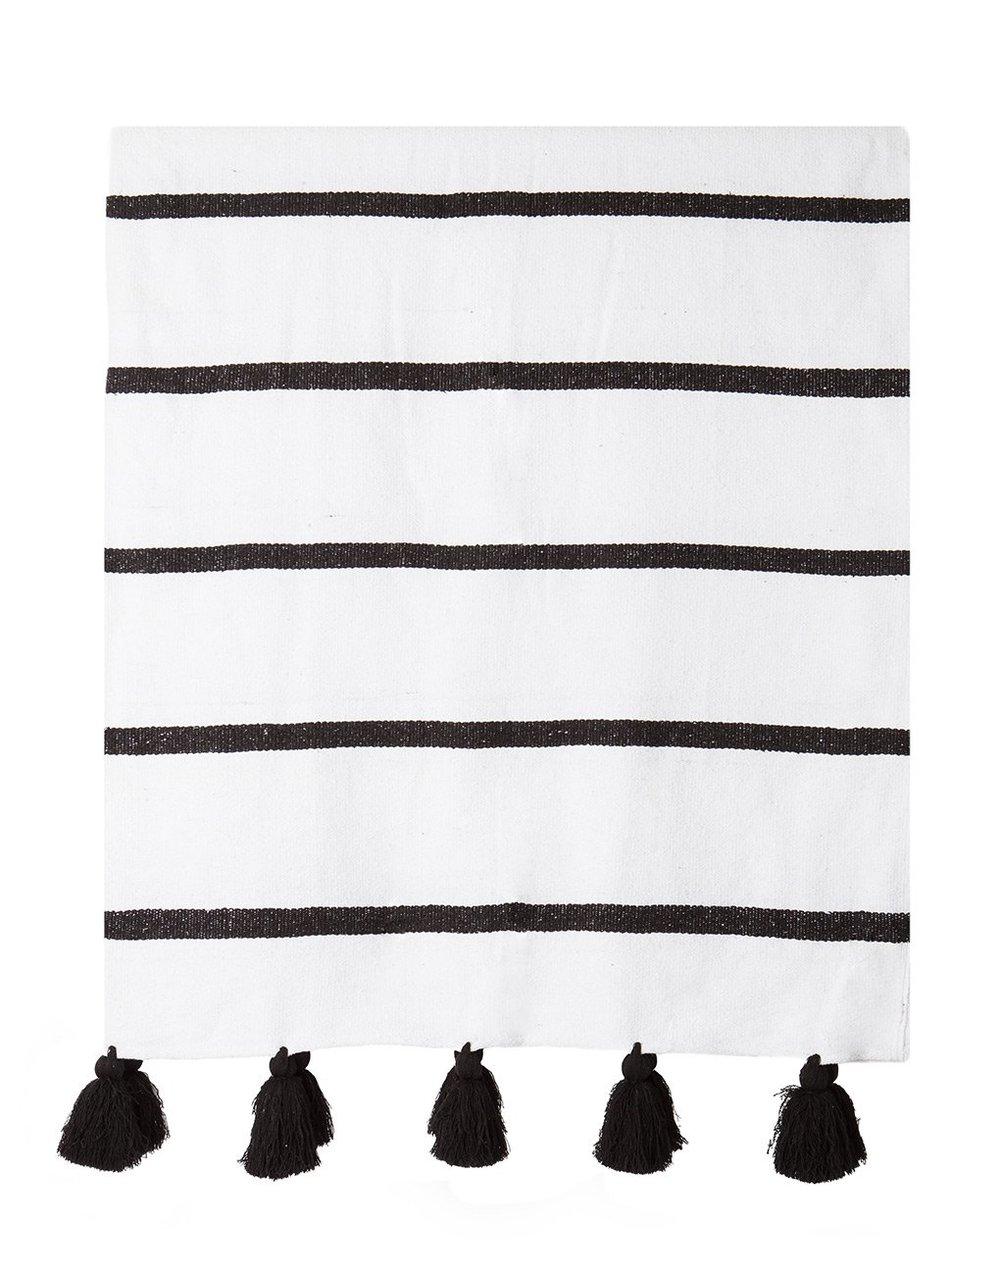 White-Pom-Pom-Blanket-Black-Stripes.jpg